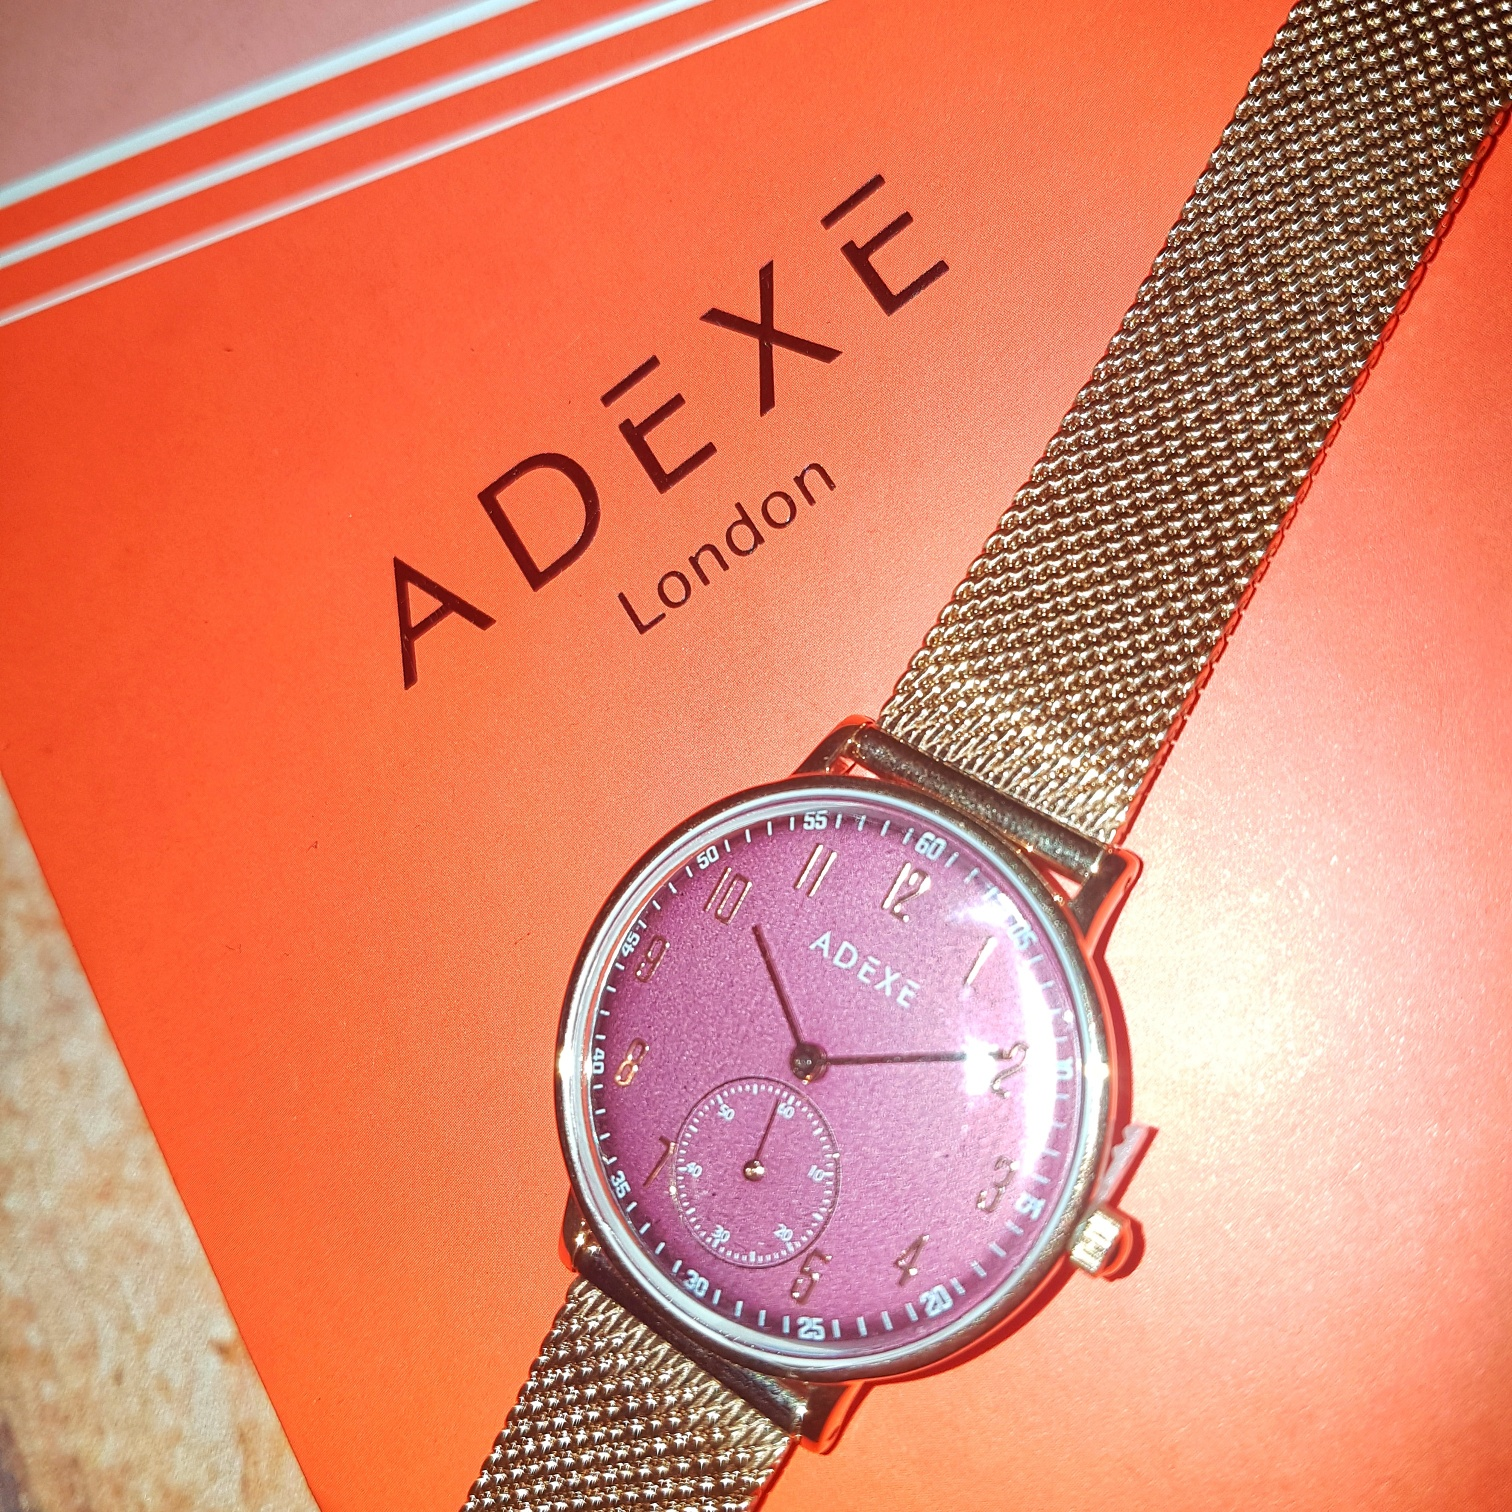 win an Adexe watch